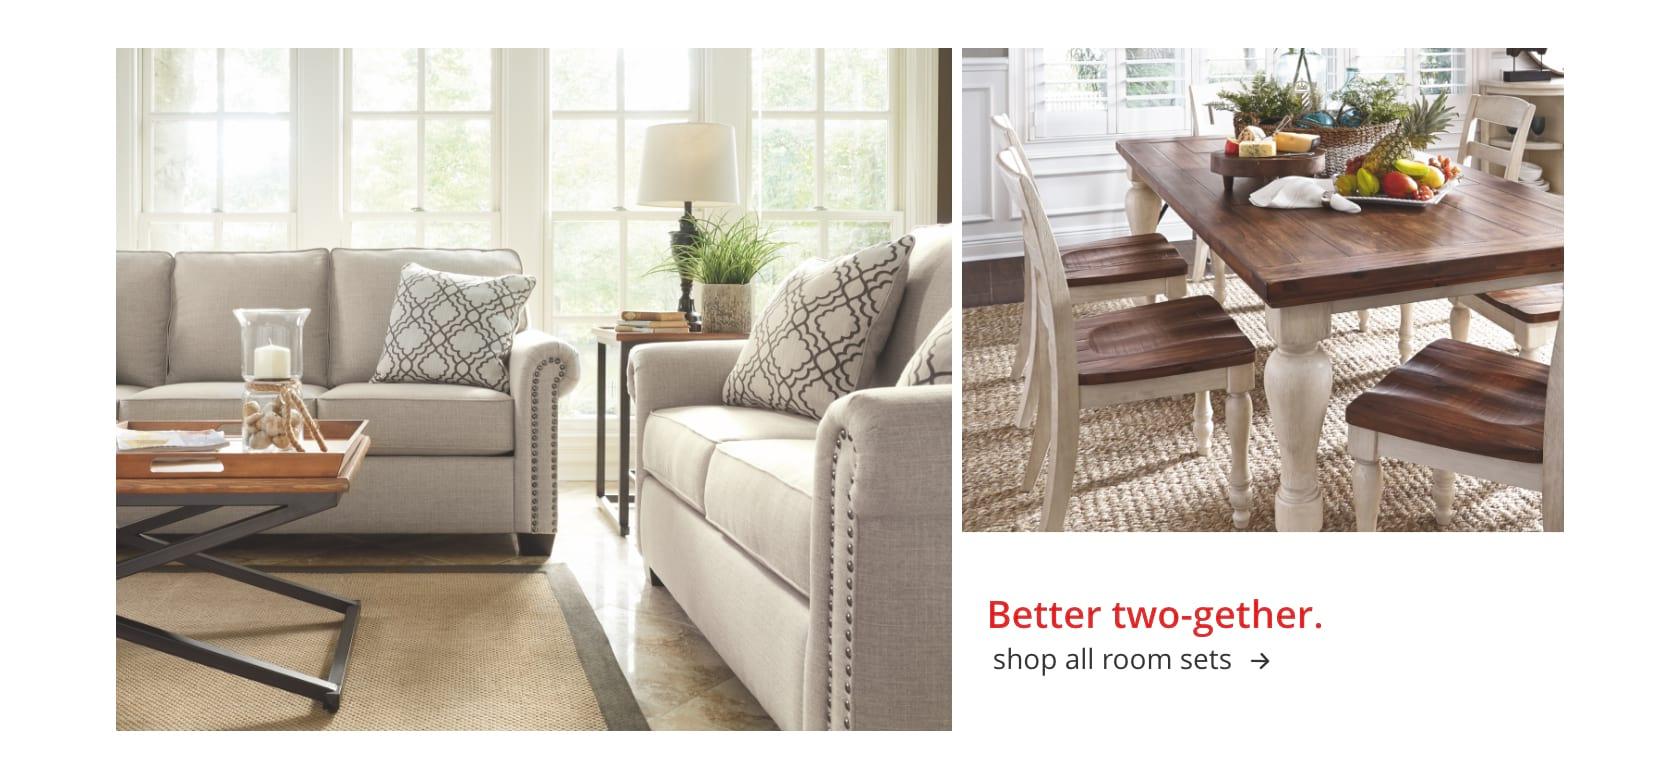 ashley furniture homestore  home furniture  decor - shop room sets